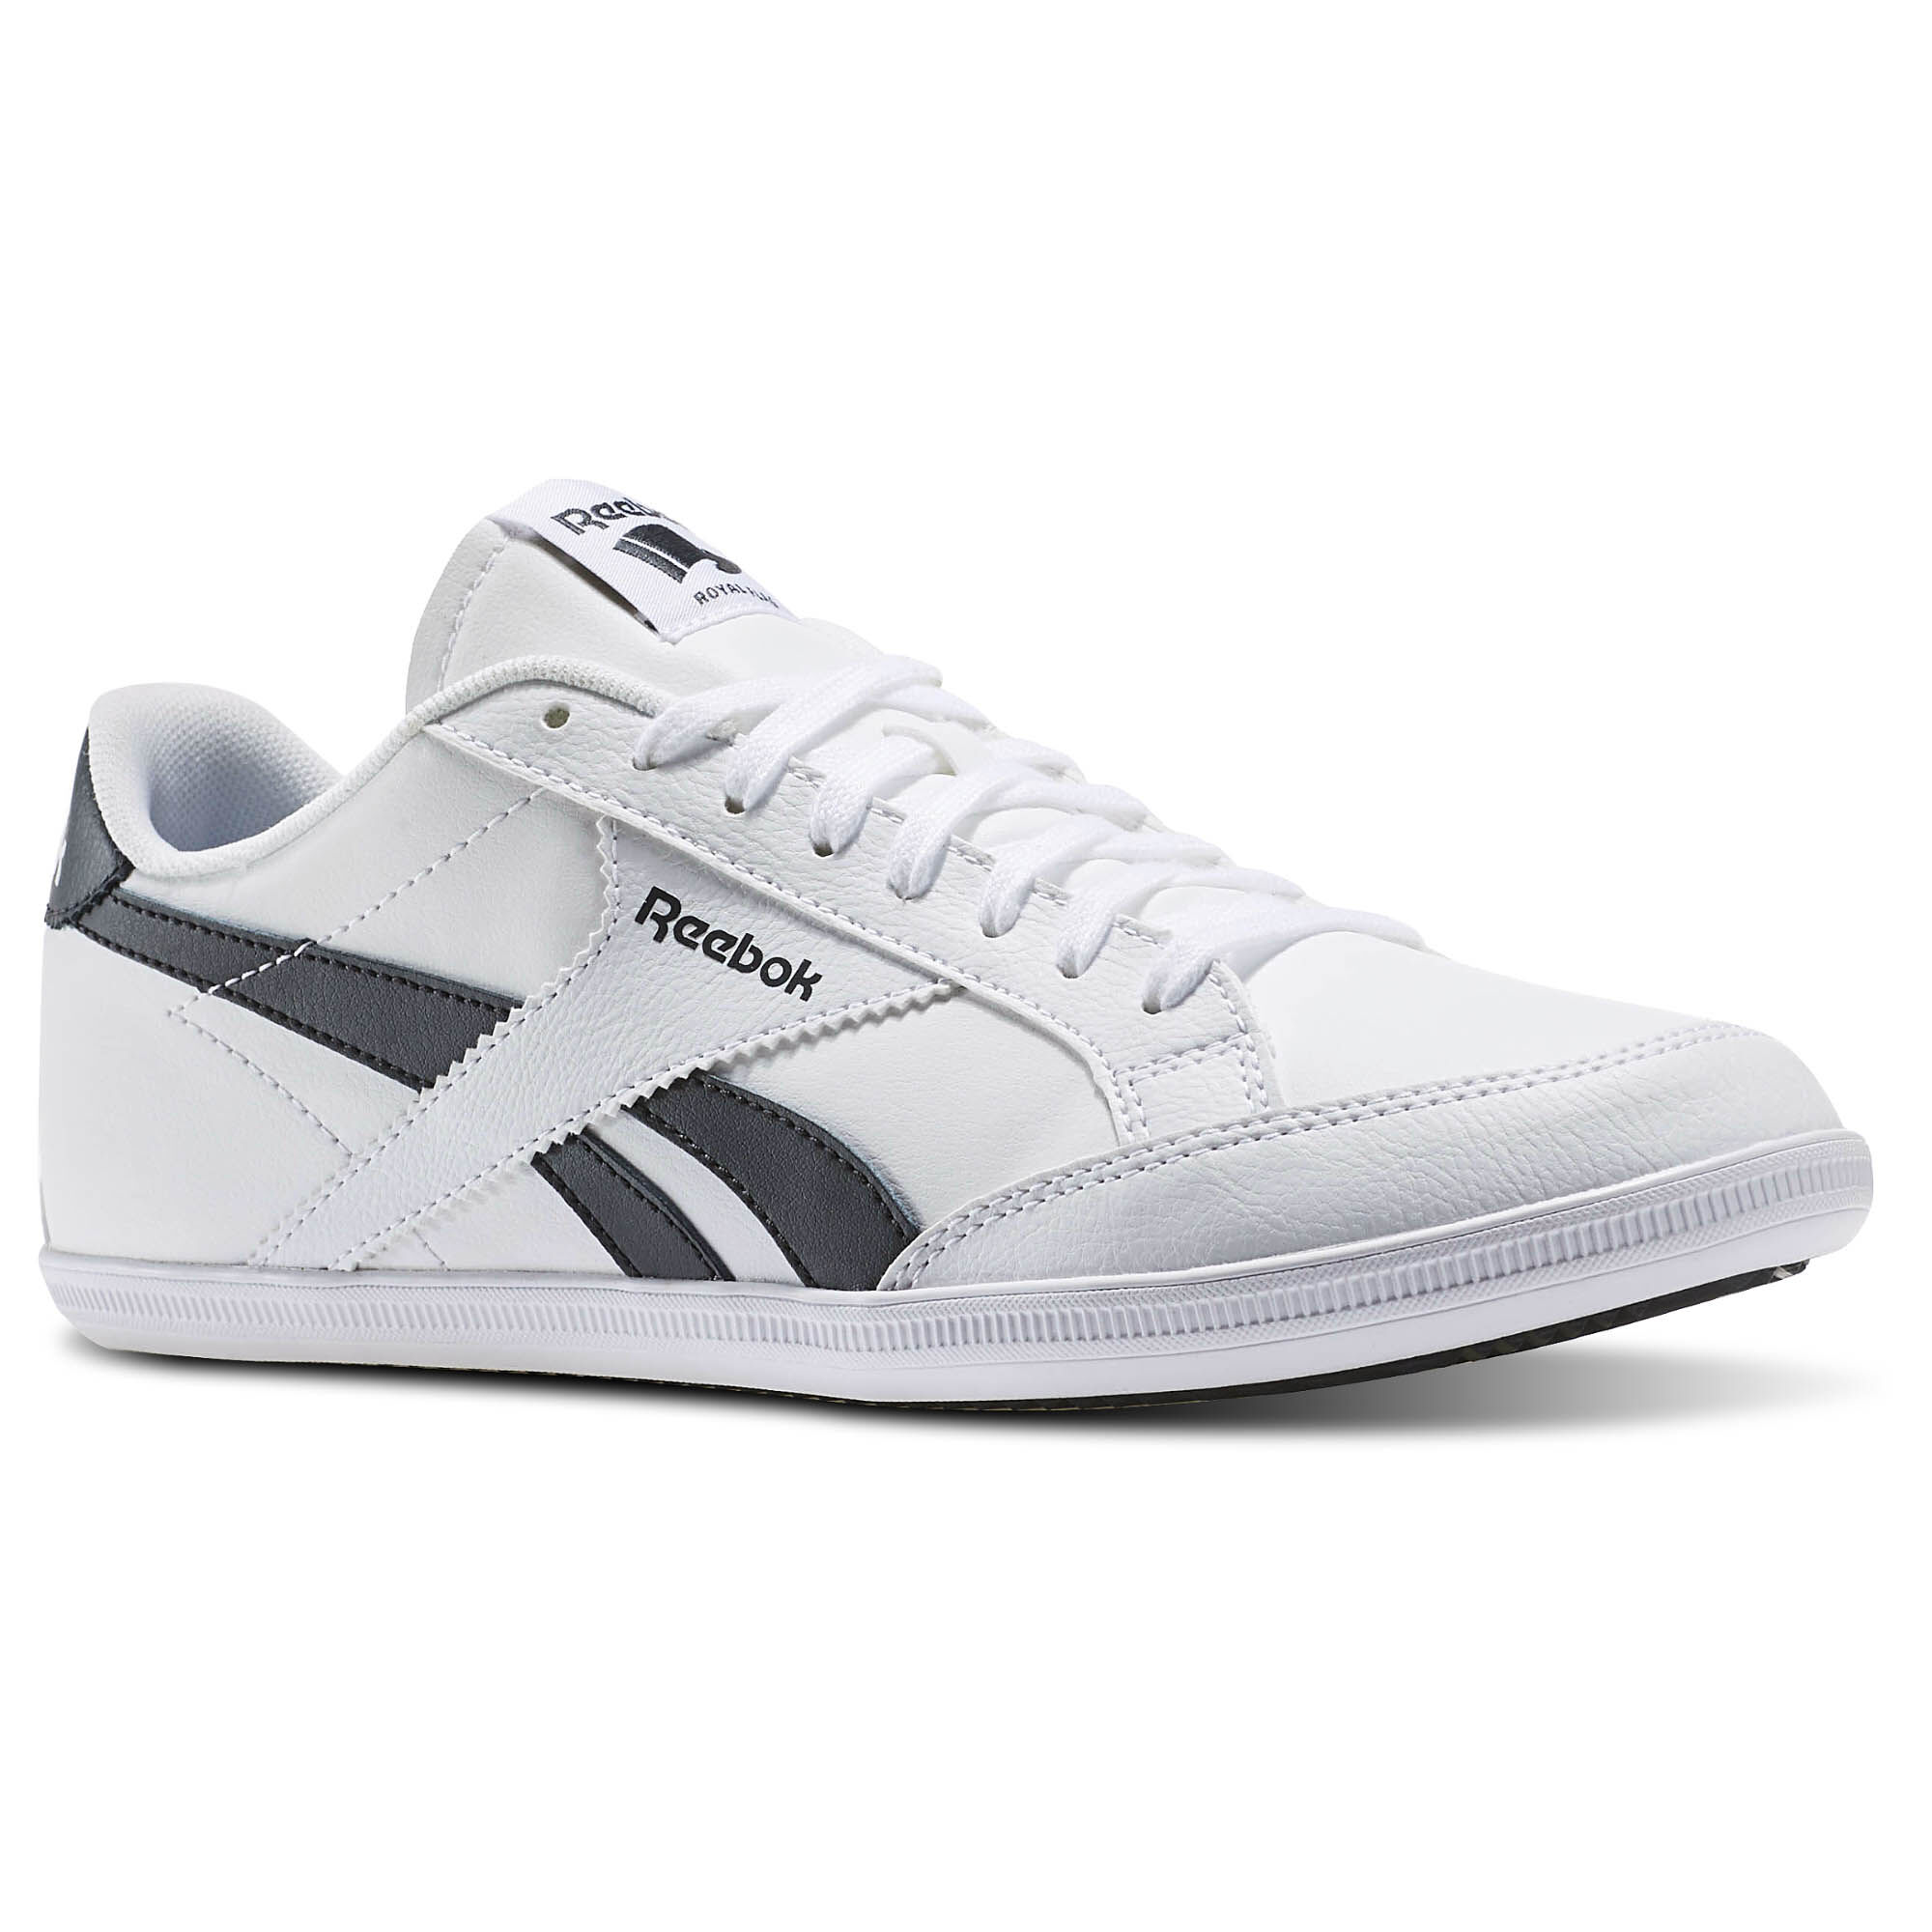 Reebok Zapatos Blancos